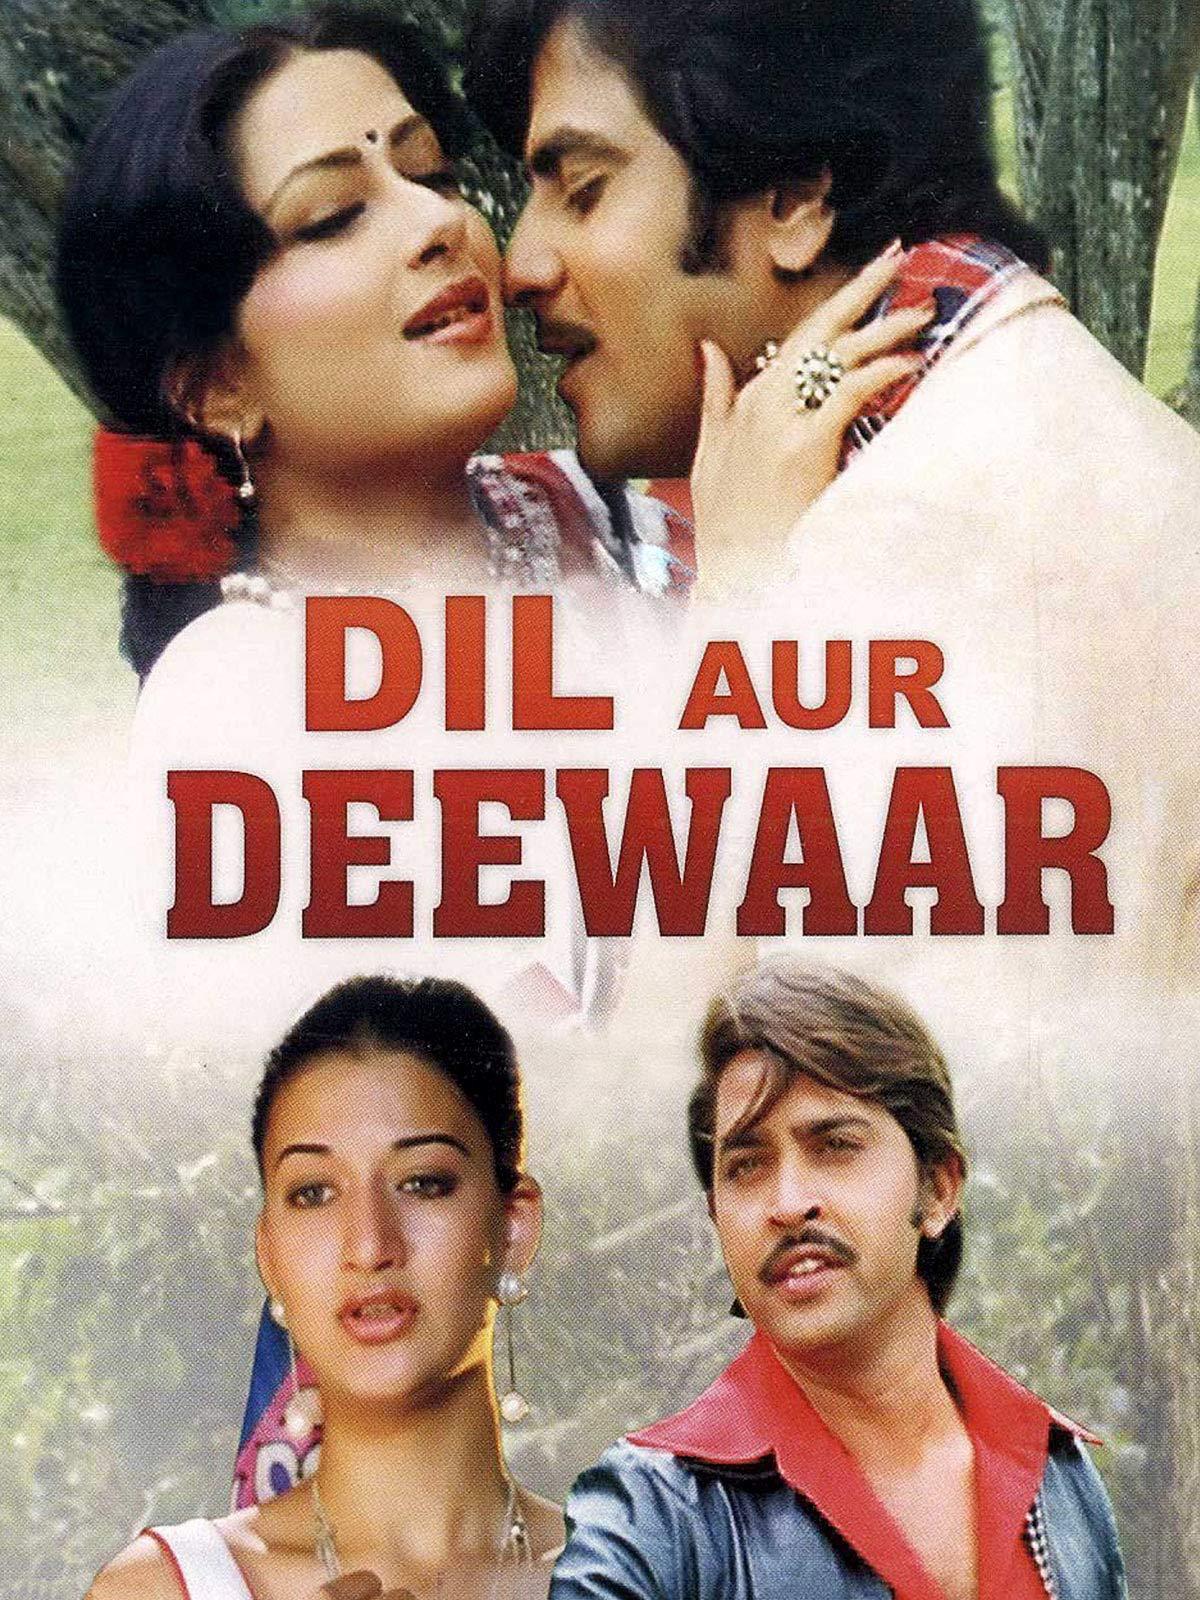 Dil Aur Deewaar